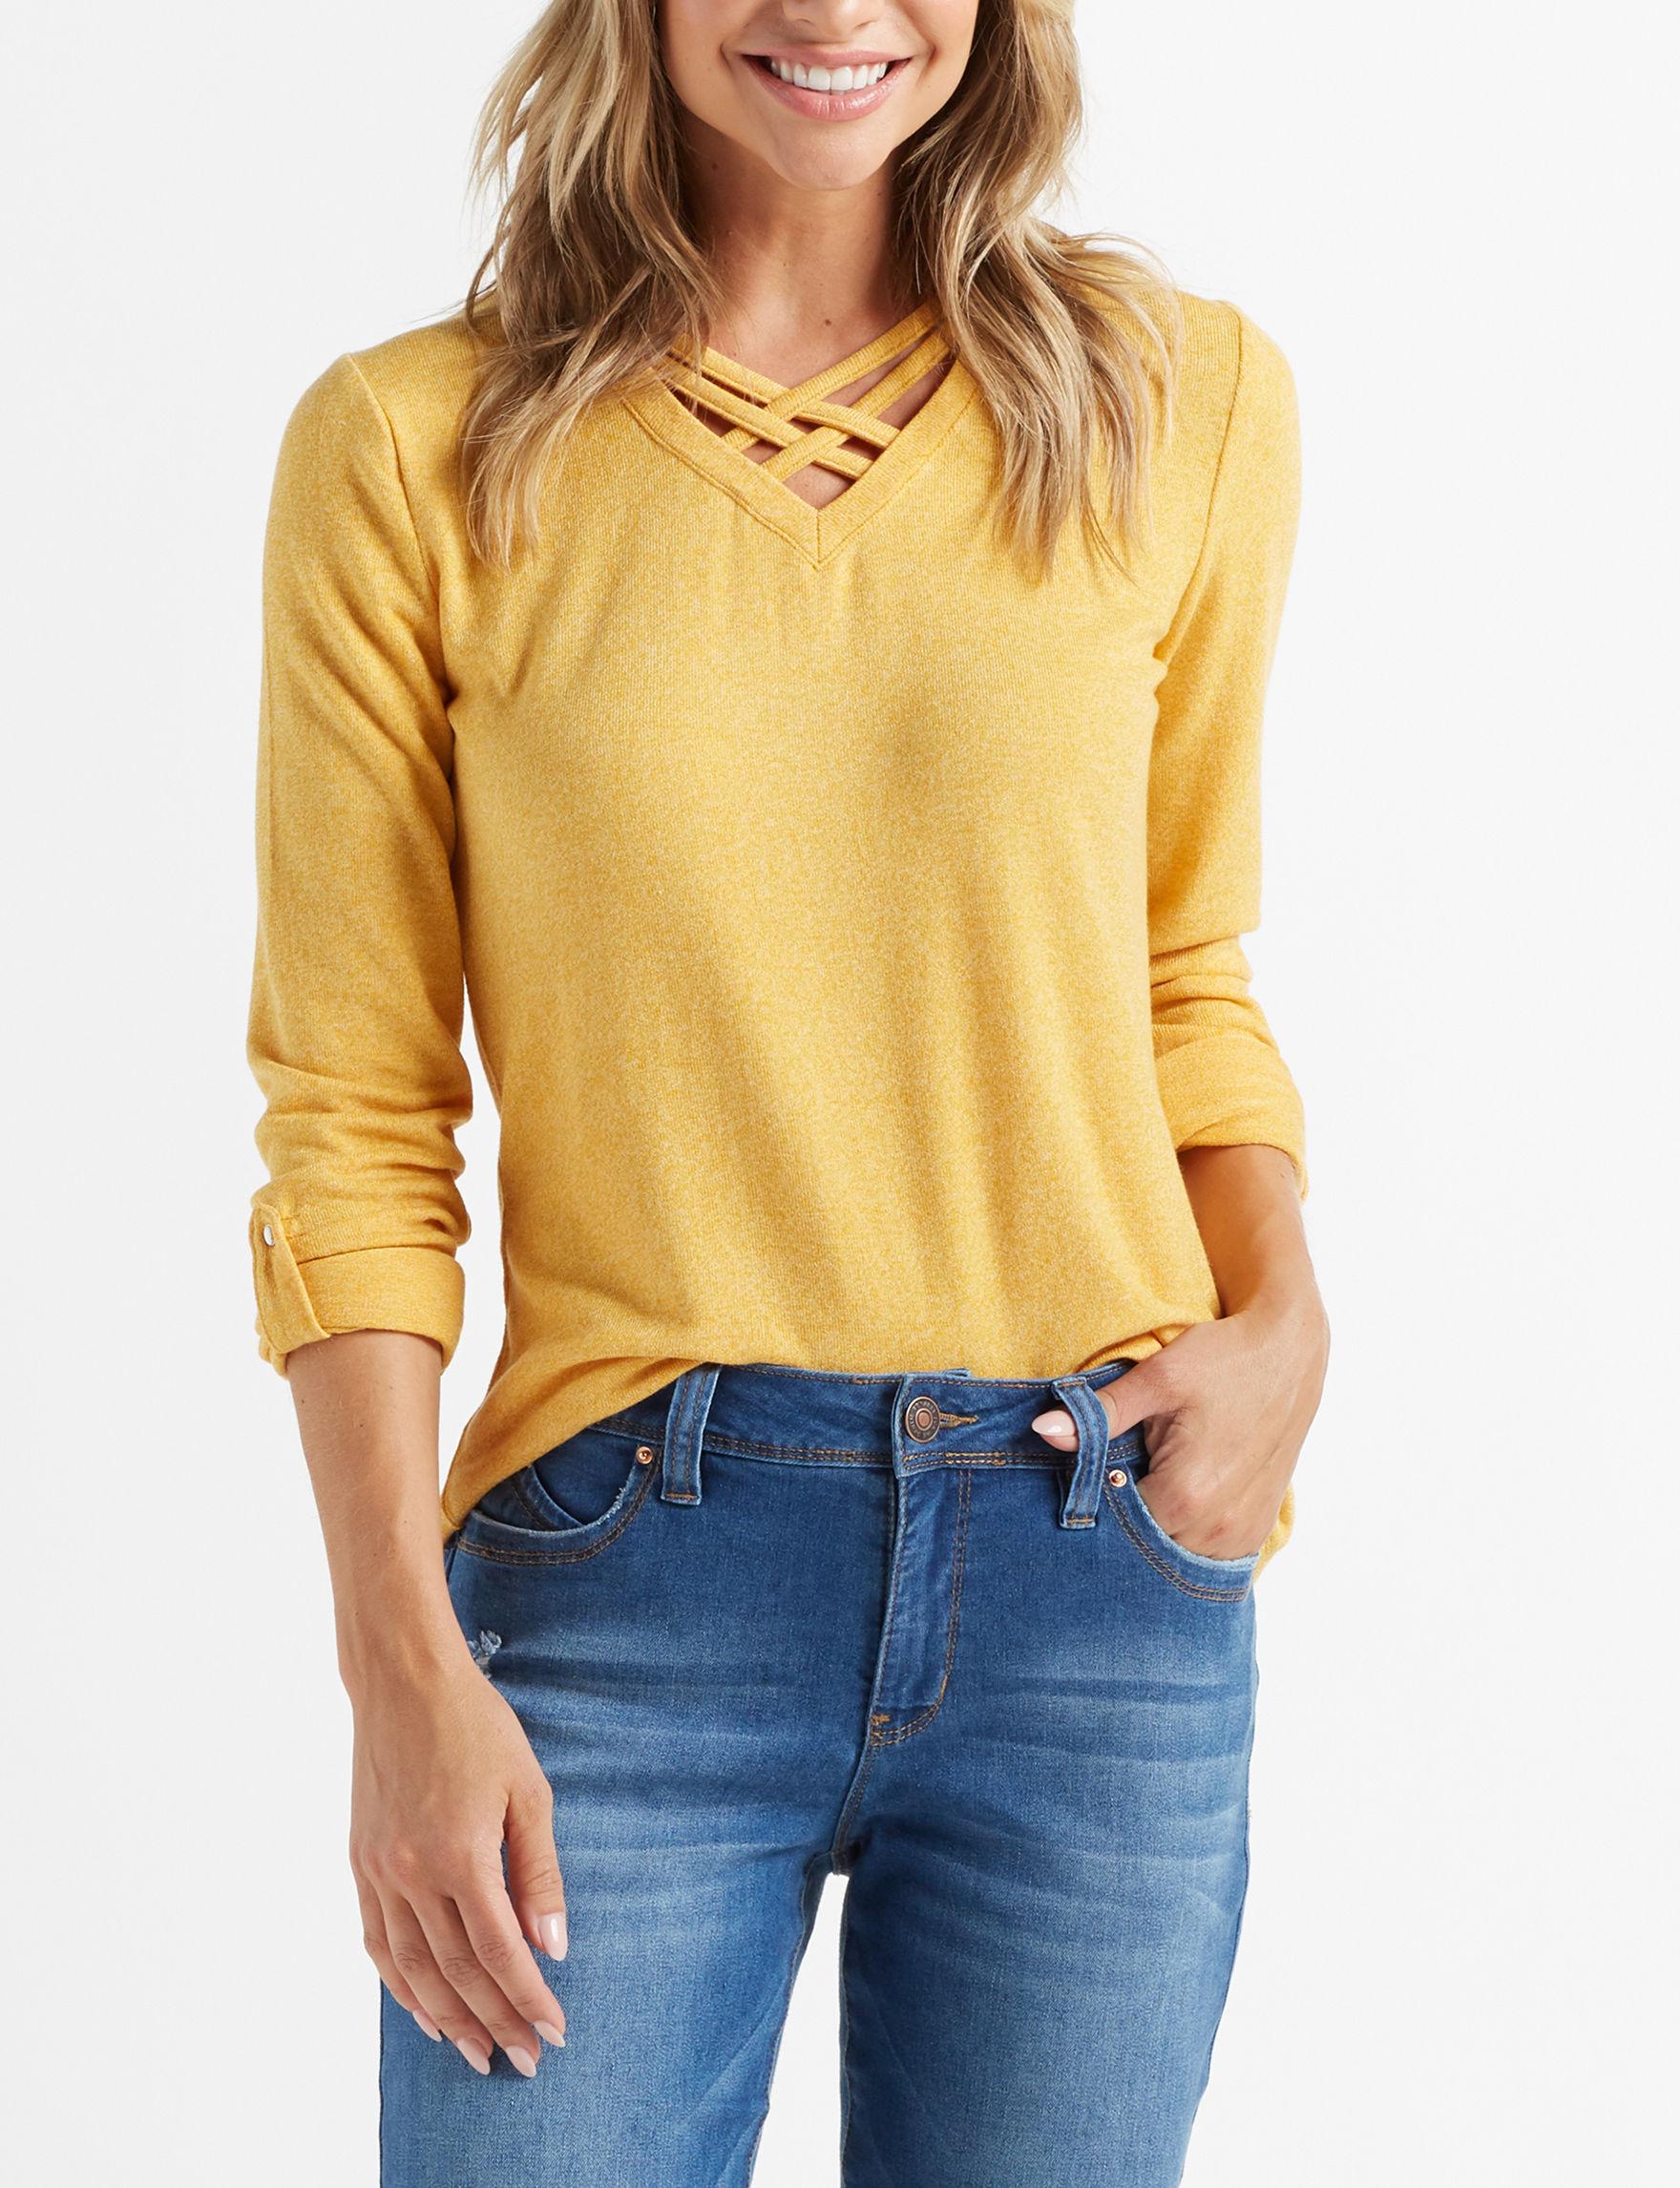 Thyme & Honey Mustard Shirts & Blouses